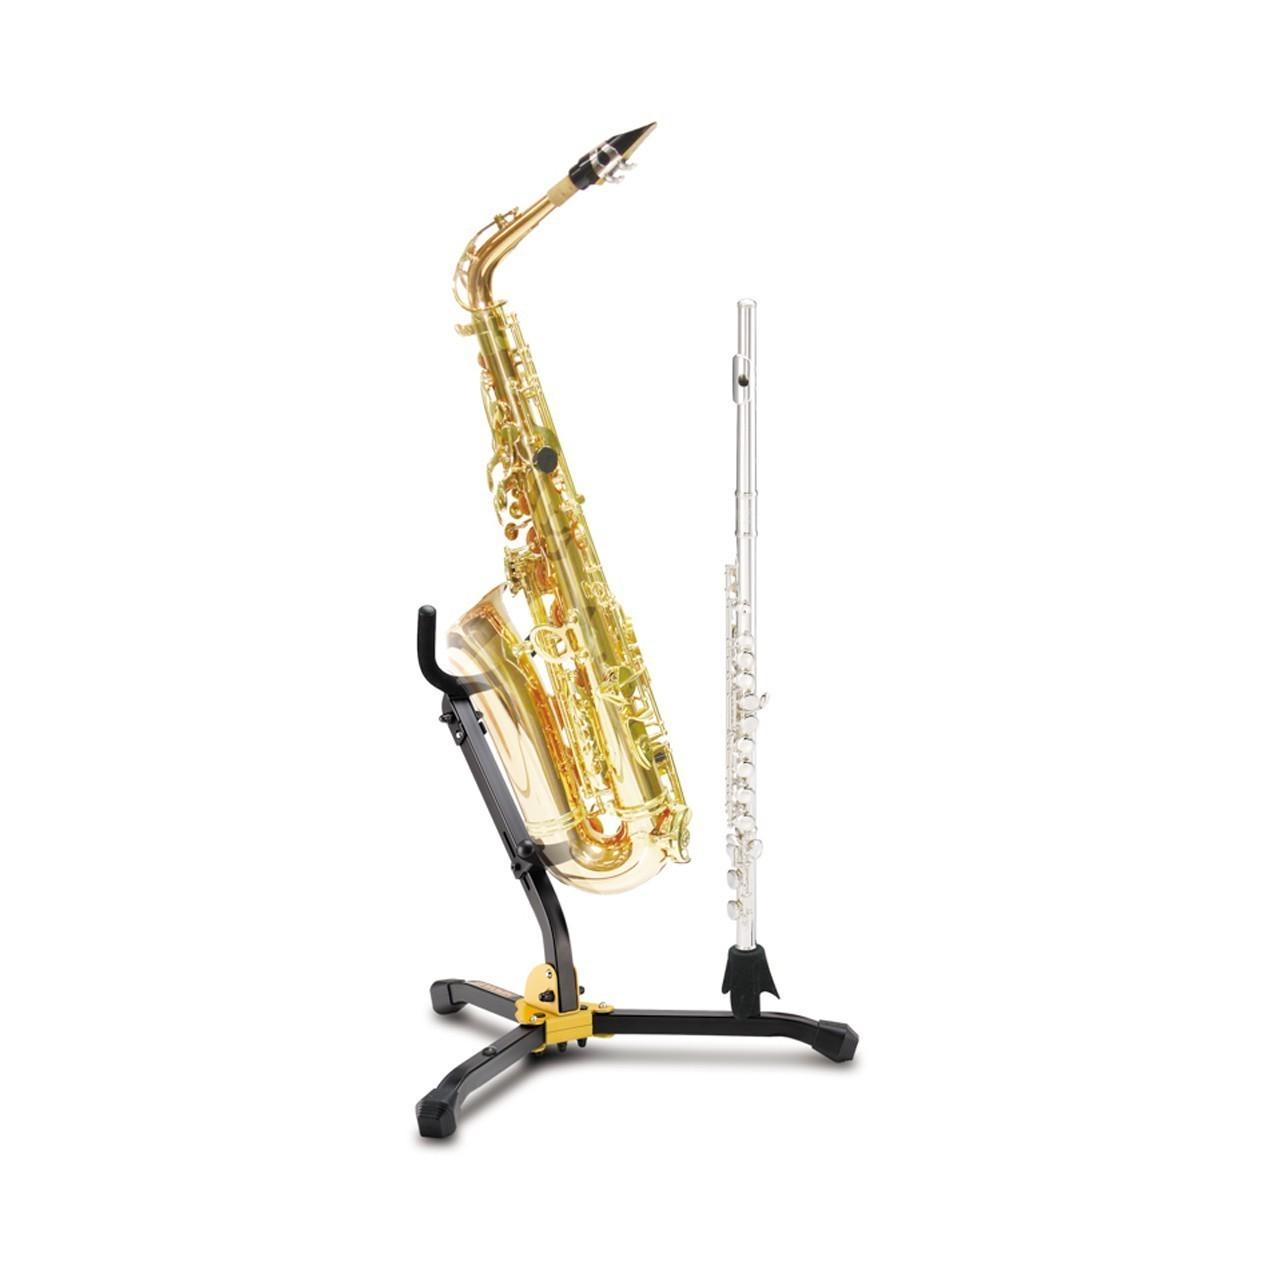 Suporte Combinado P/sax Alto Tenor/ Clarinete Flauta Ds532bb Hercules